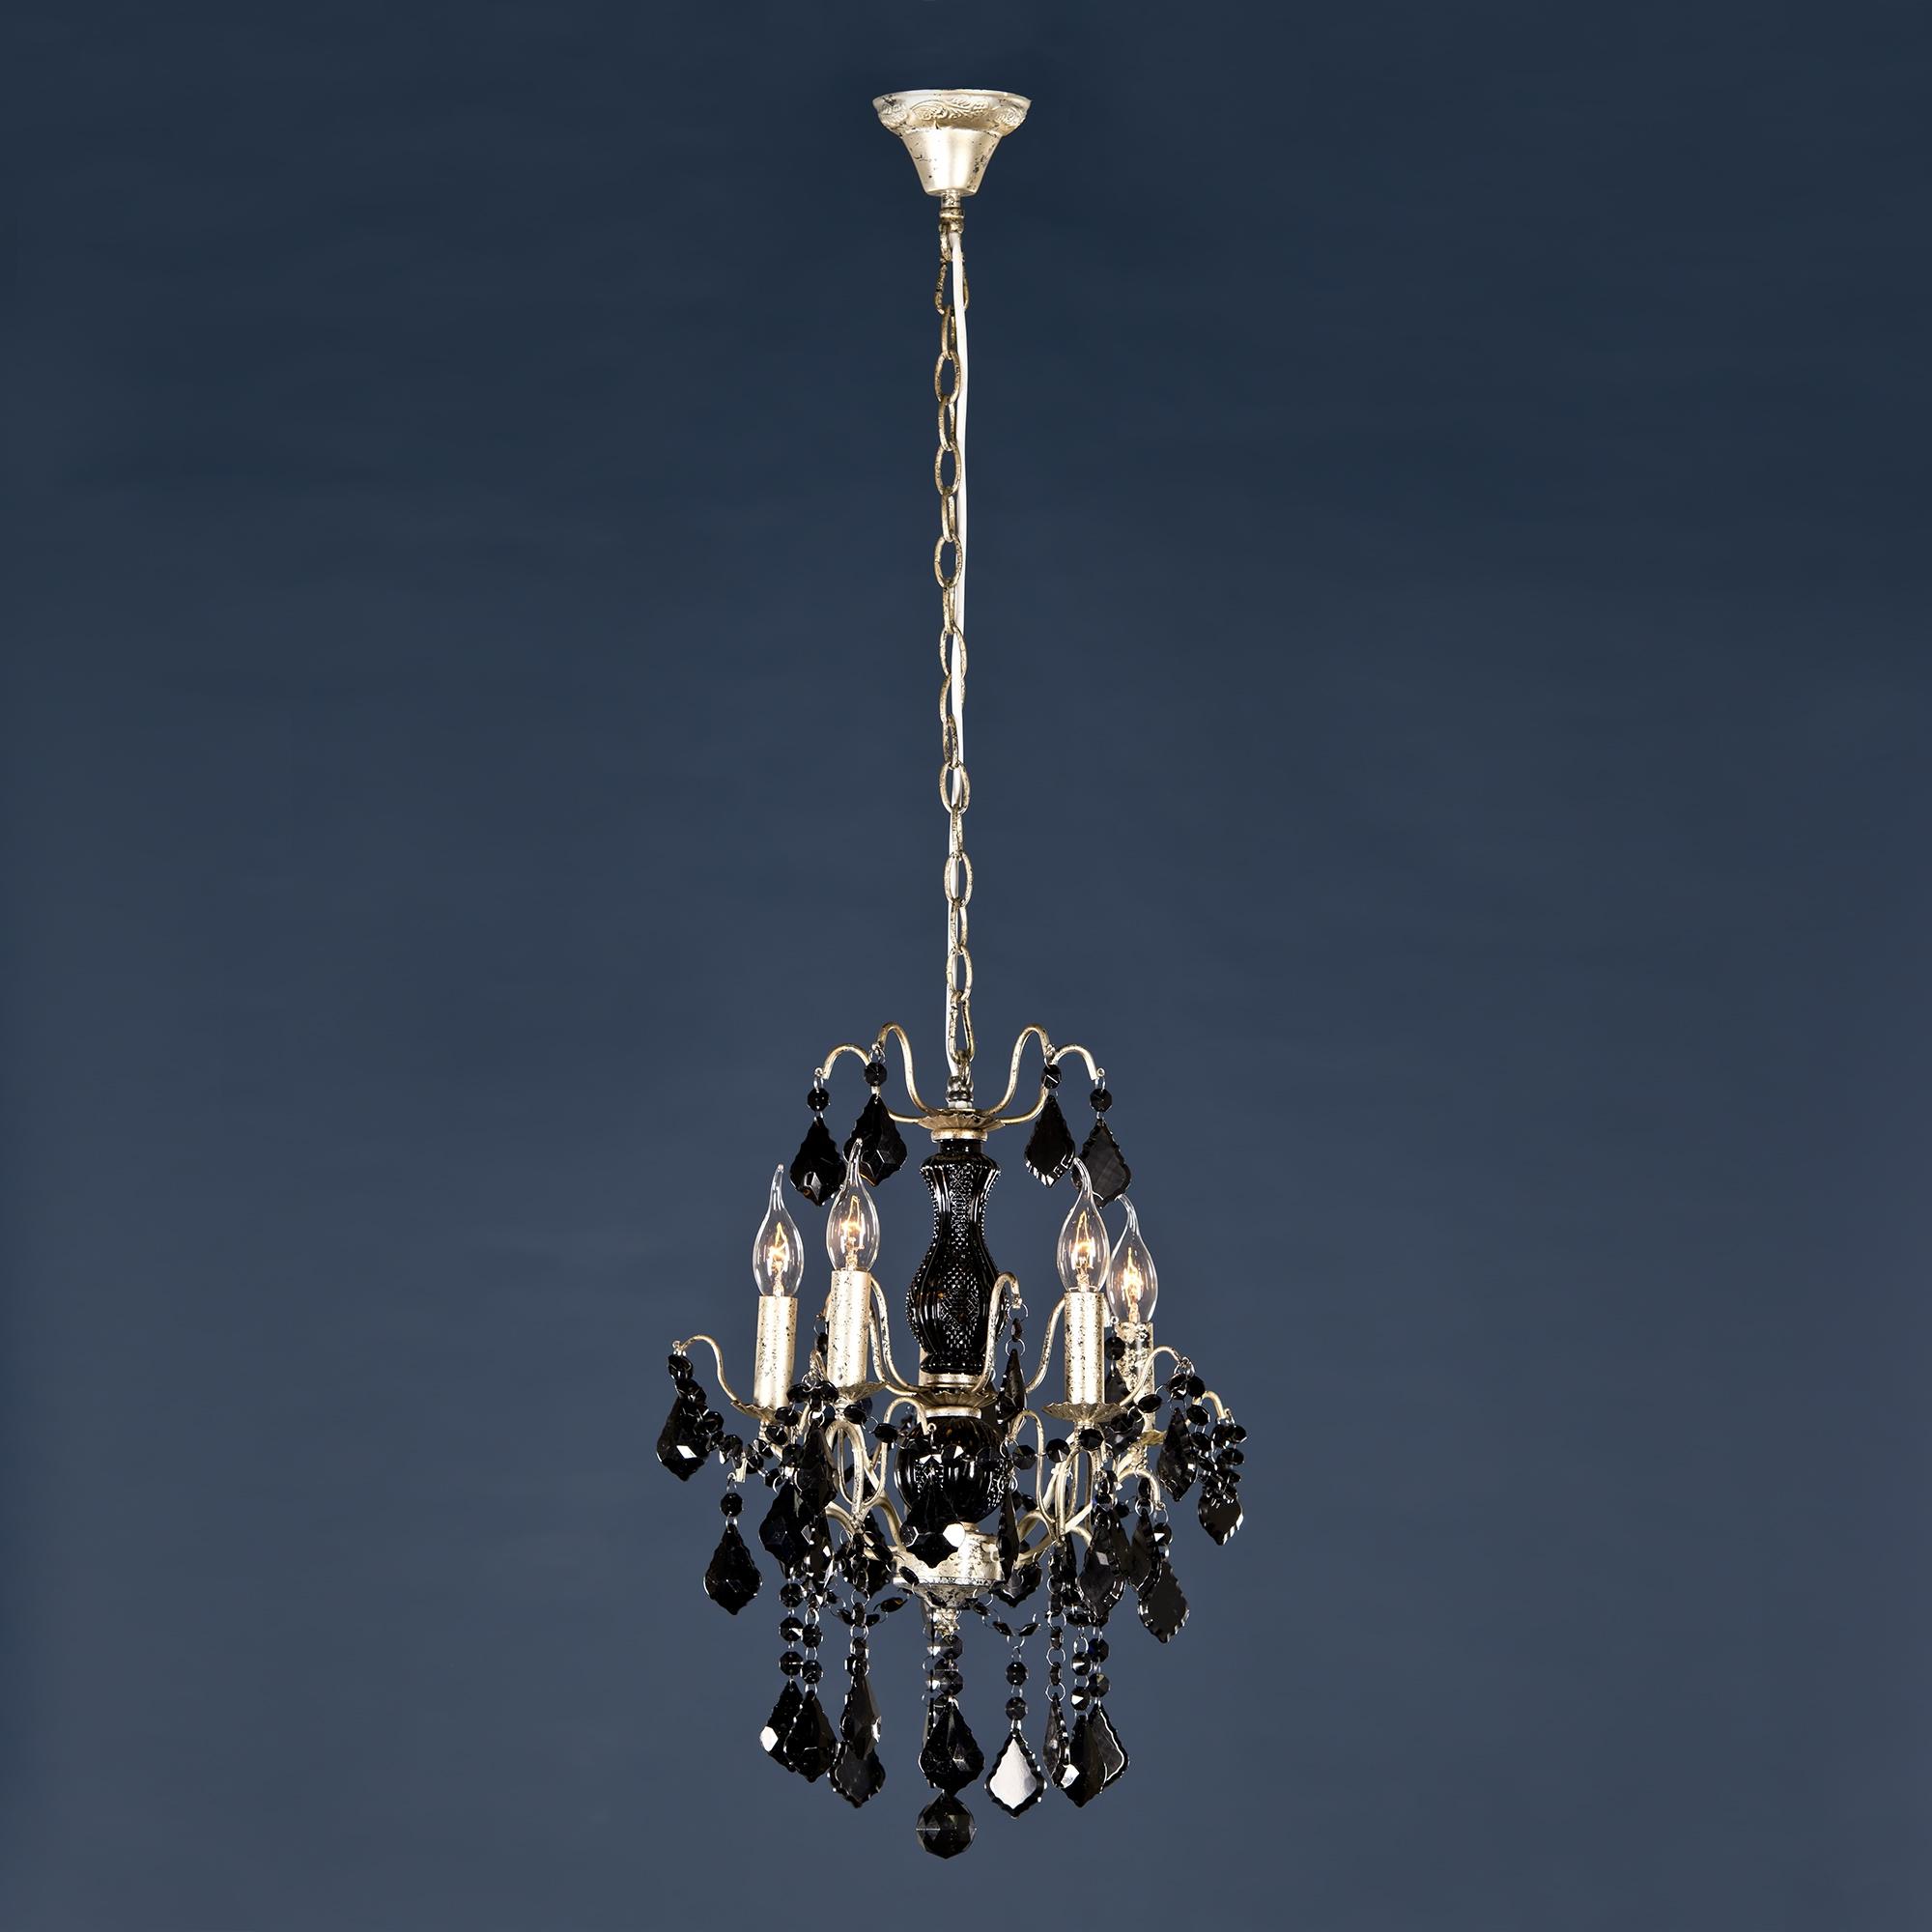 Charlotte 5 Light Chandelier - Silver and Black